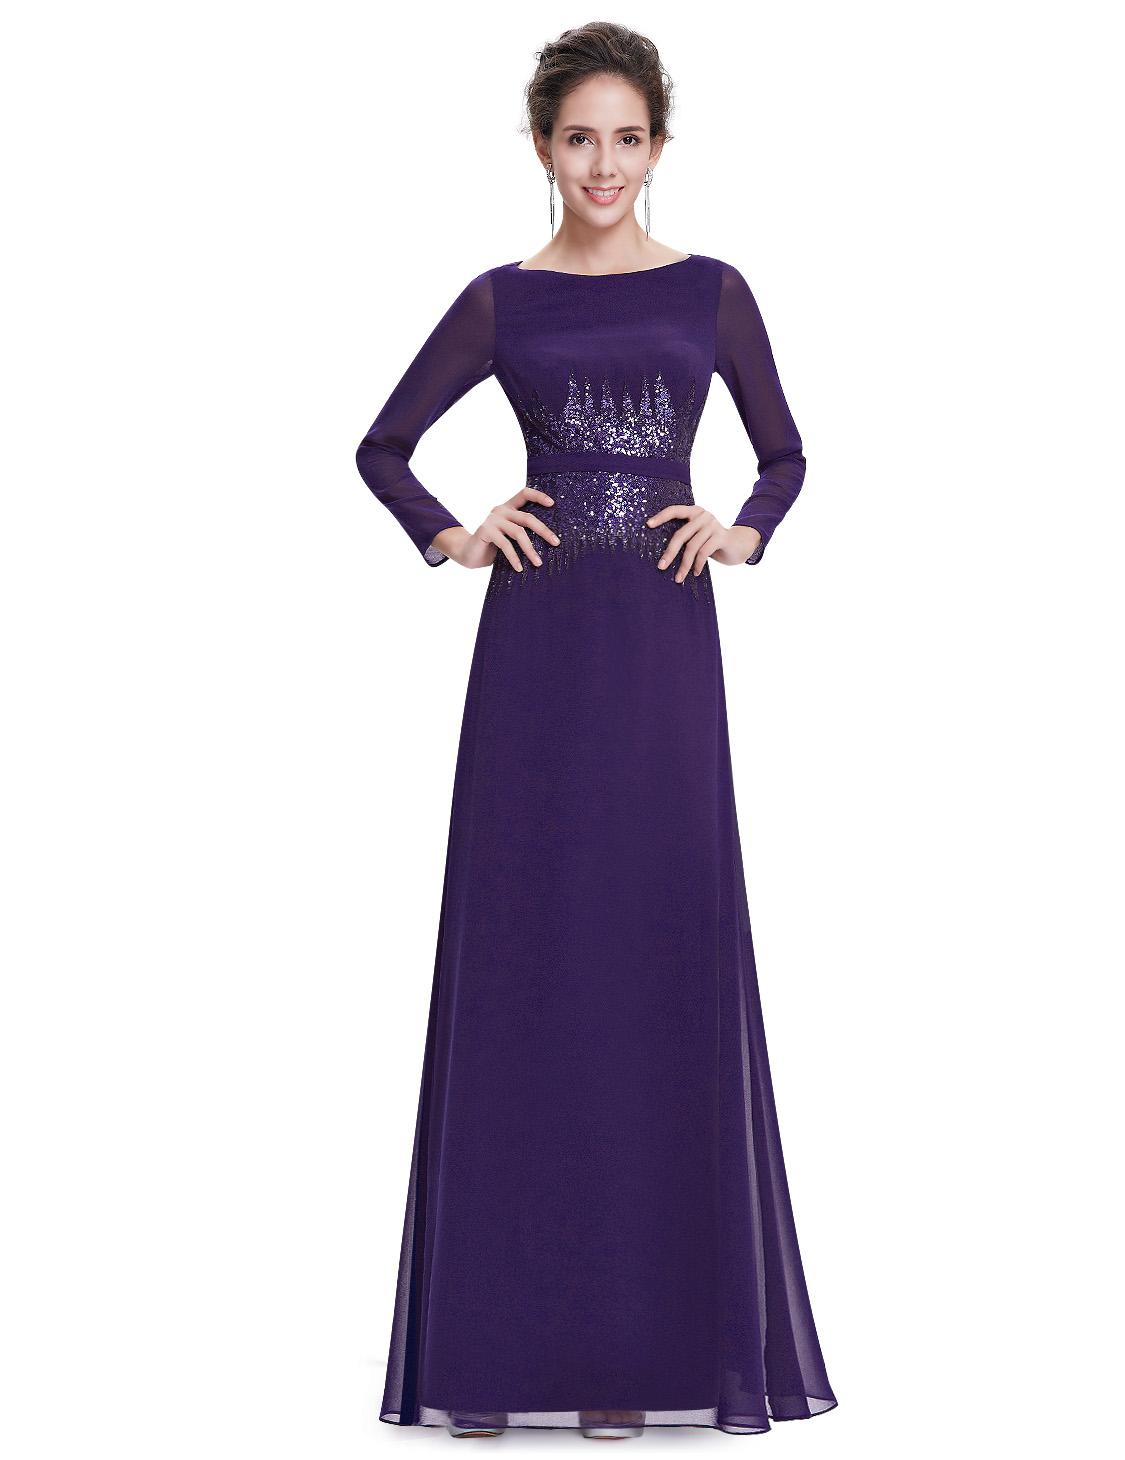 Formal Dresses Ebay Uk Formal Dresses